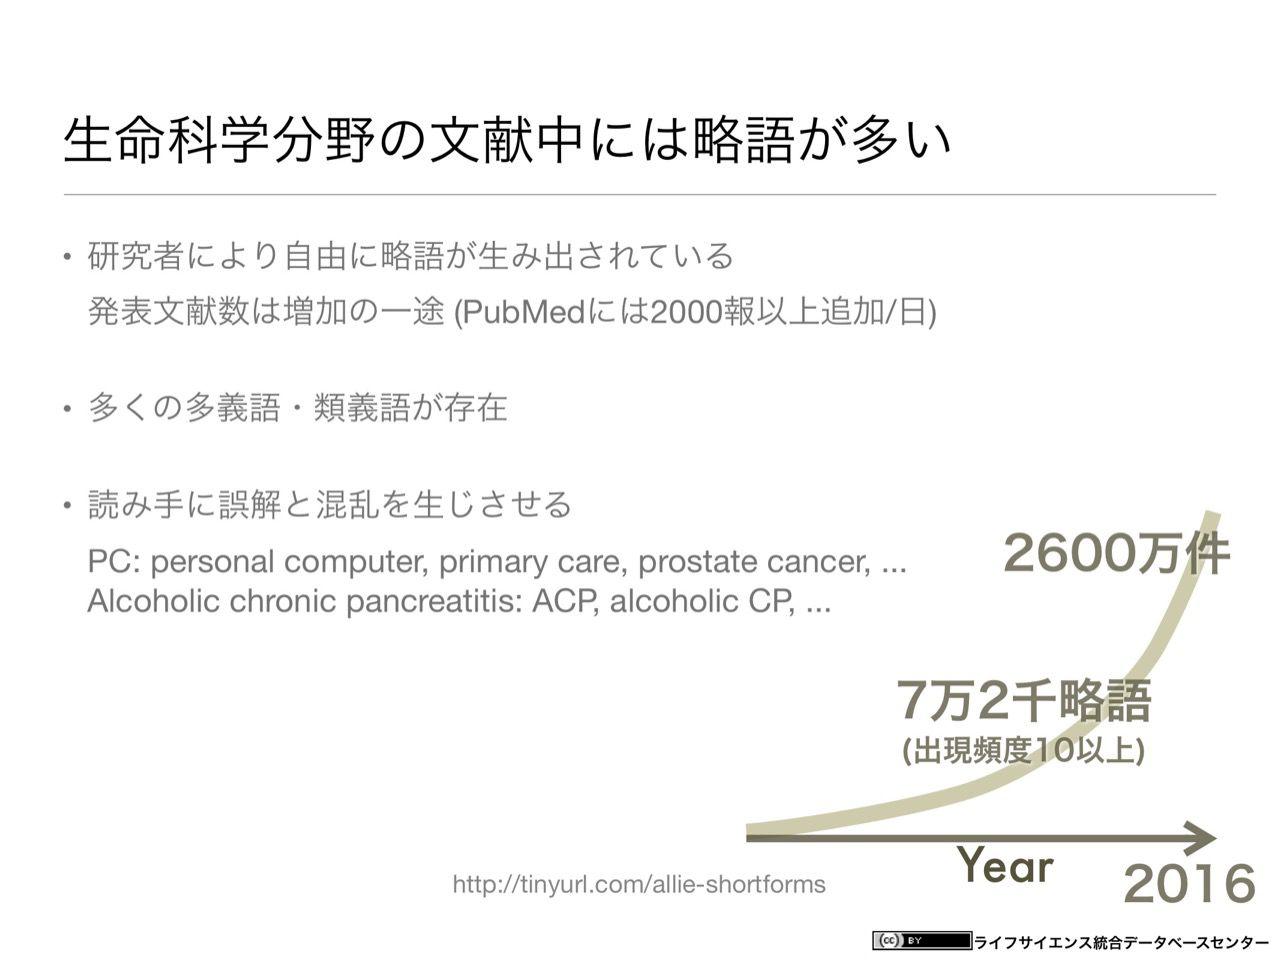 images/AJACS60_yamamoto_036.jpg